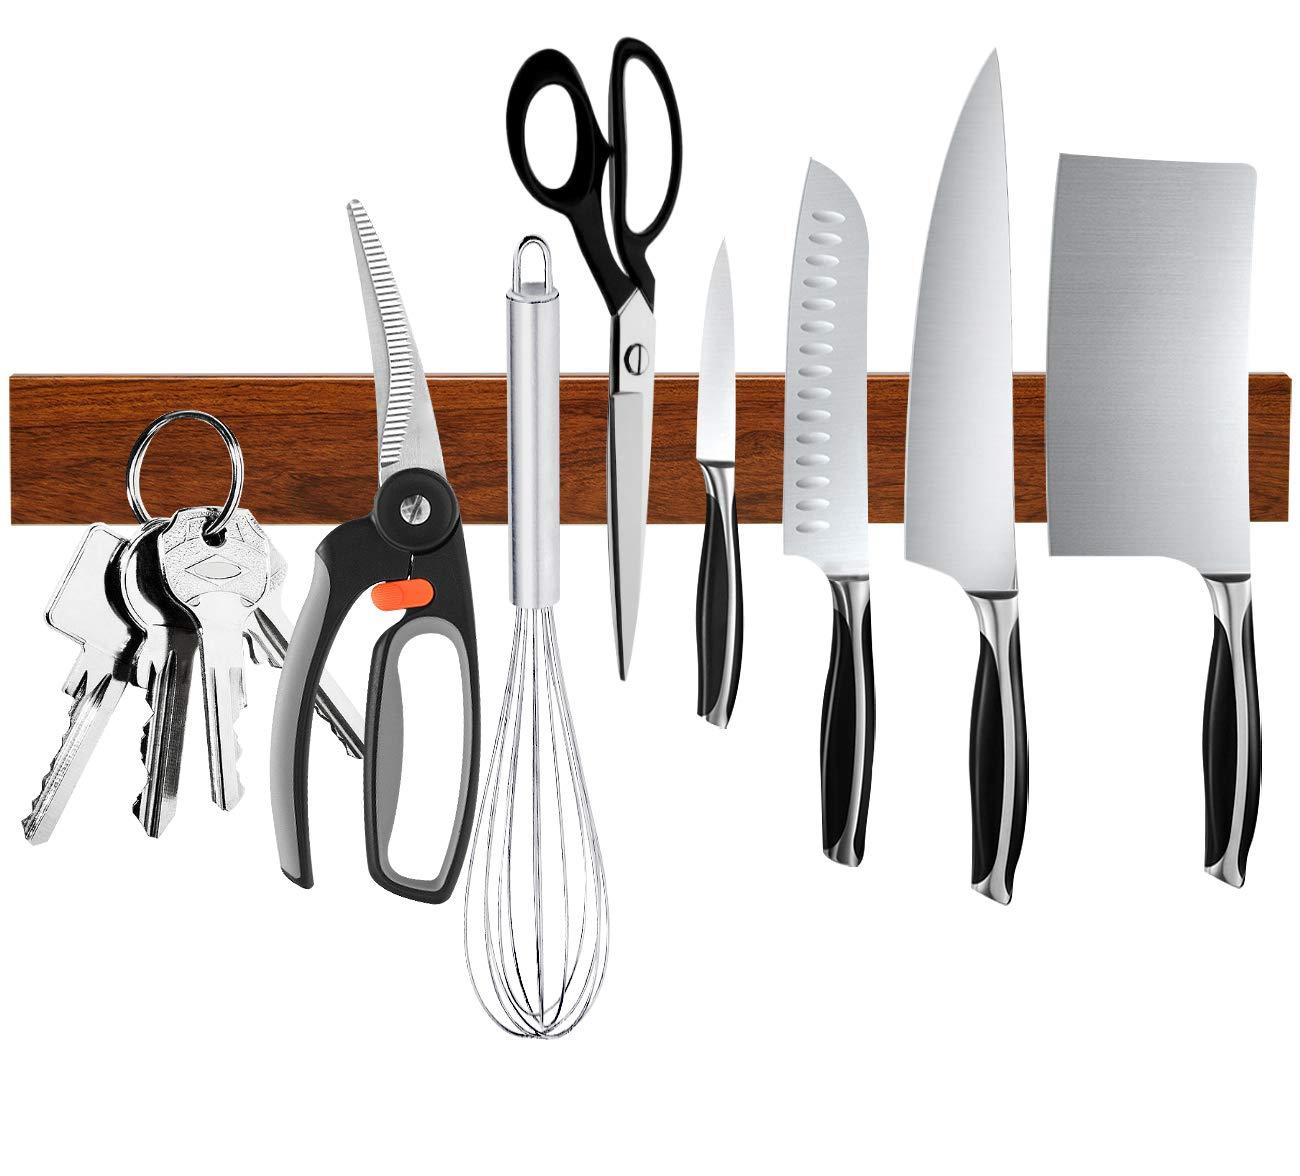 Magnetic Knife Holder, Ouddy 16 Inch Magnetic Knife Strip, Multipurpose Magnetic Knife Rack Bar Block, Kitchen Knife Magnet for Home Tool Organization by Ouddy